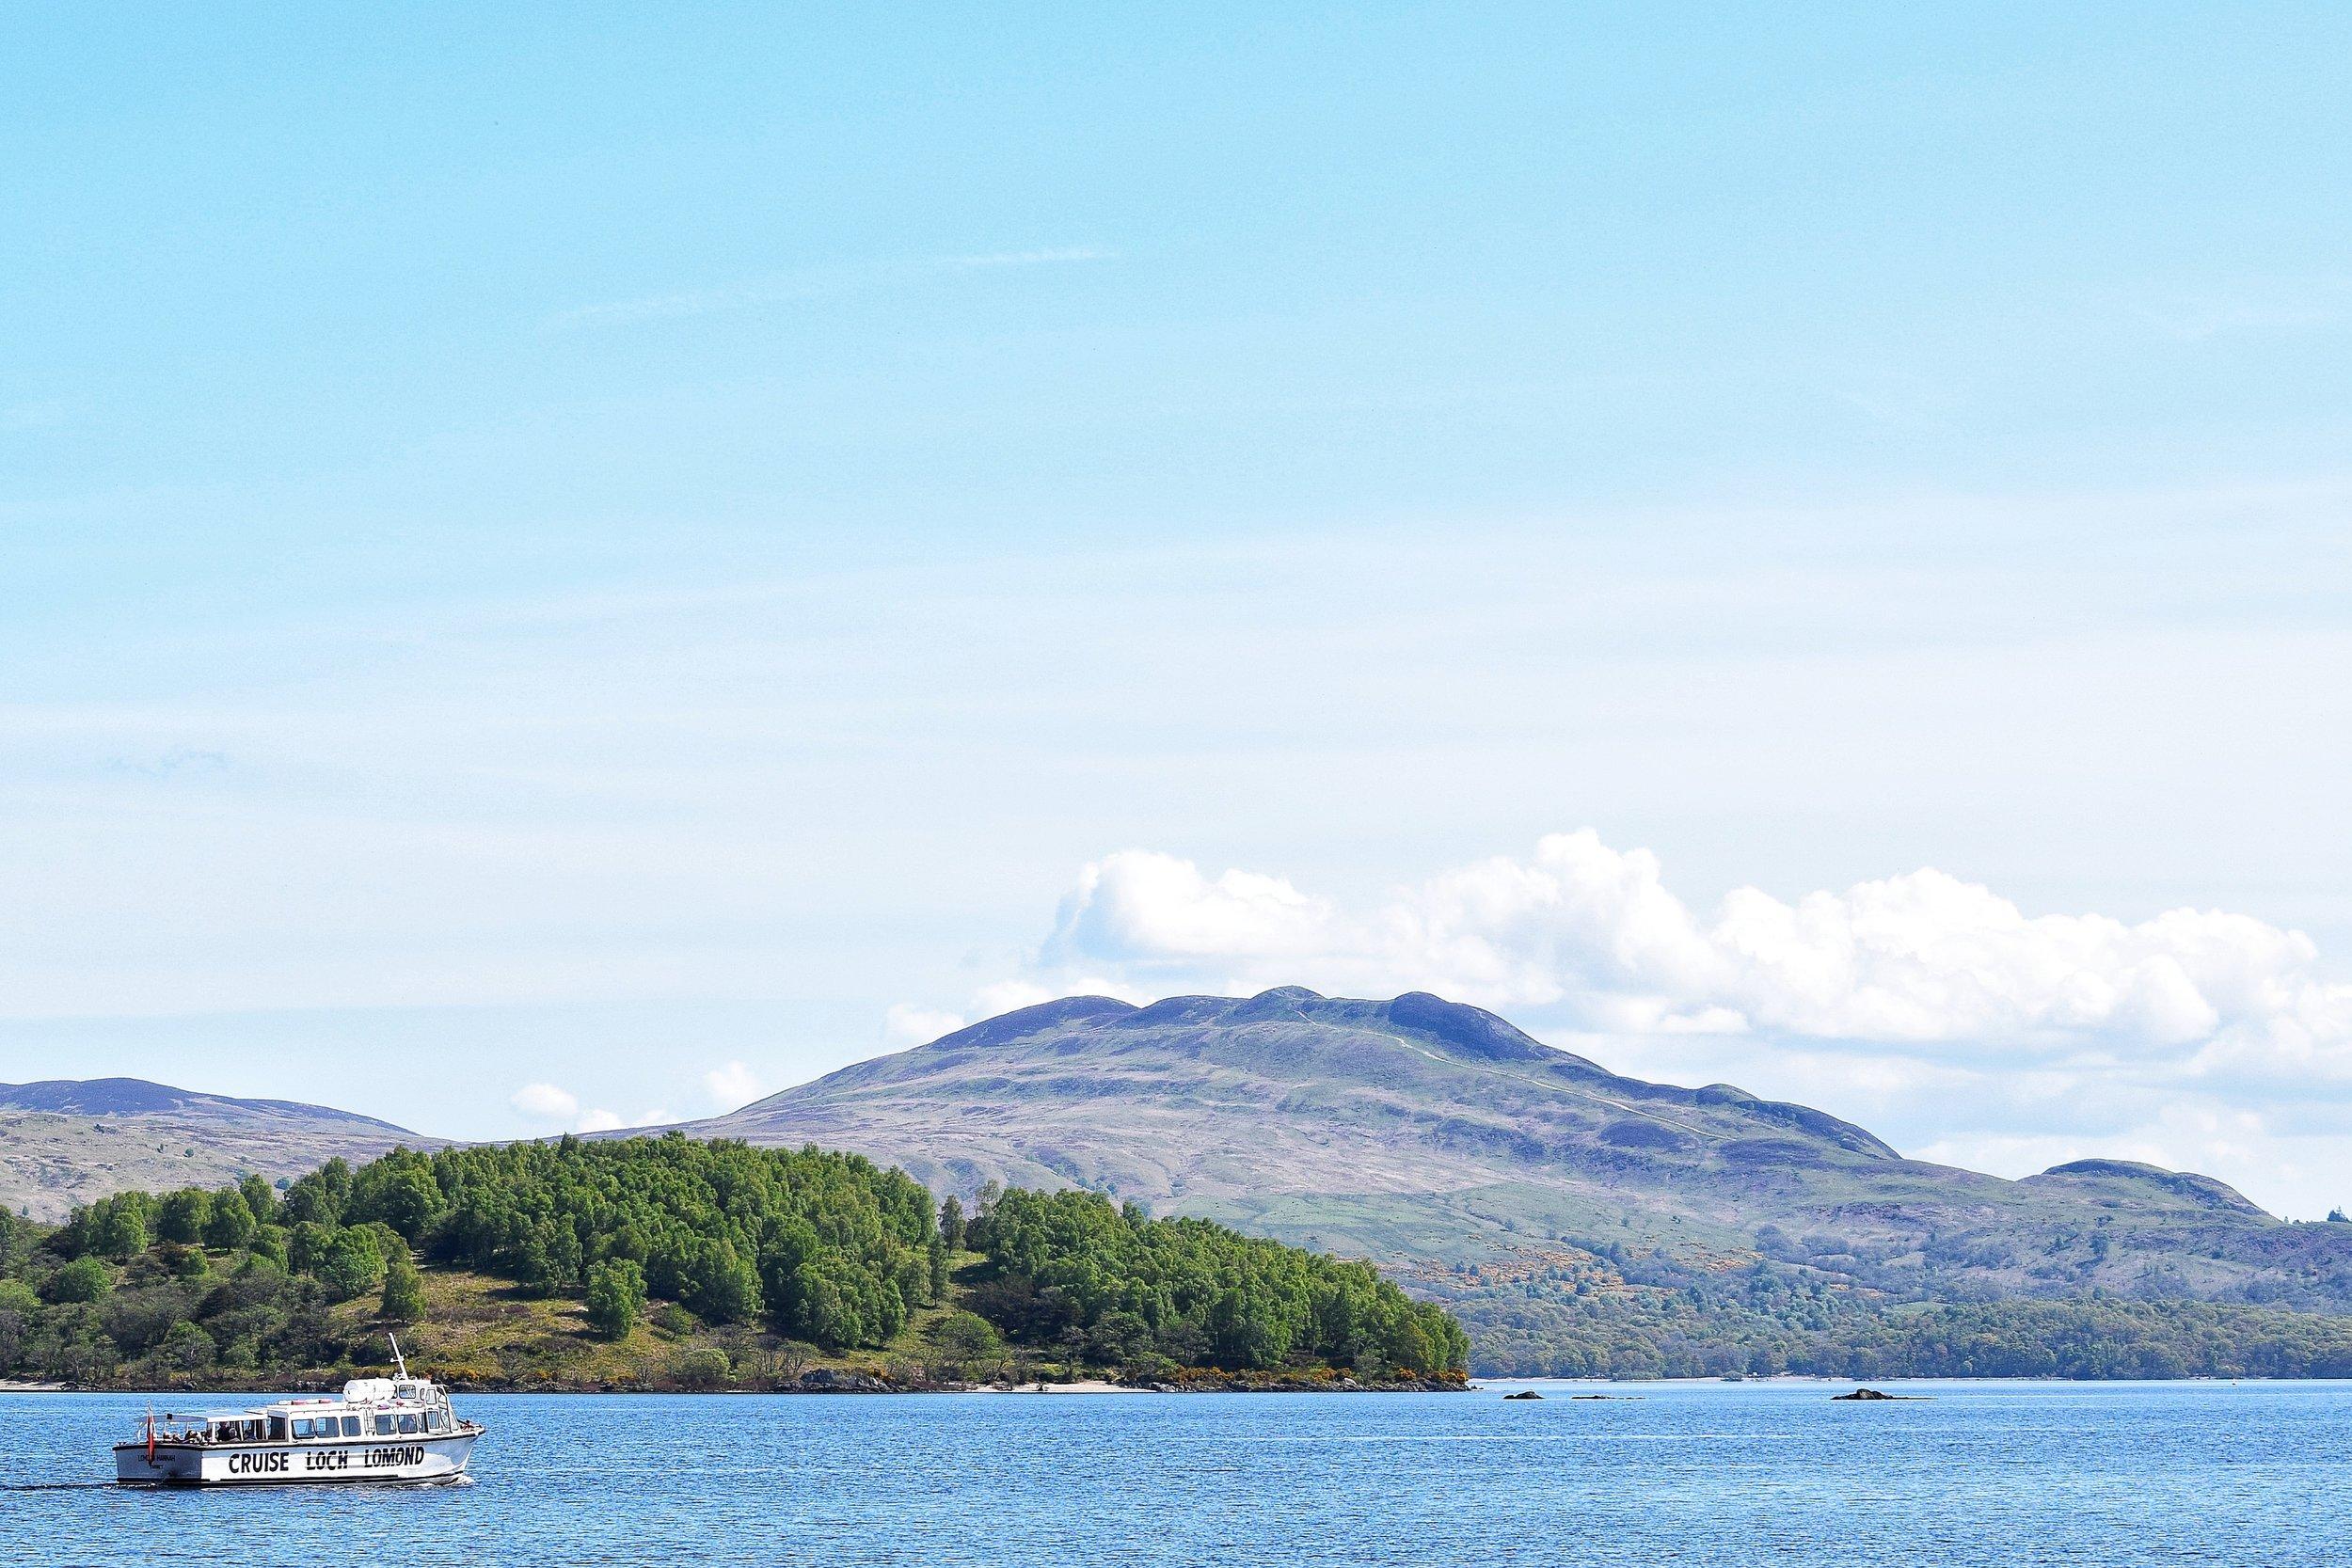 Loch Lomond, Luss, Scotland